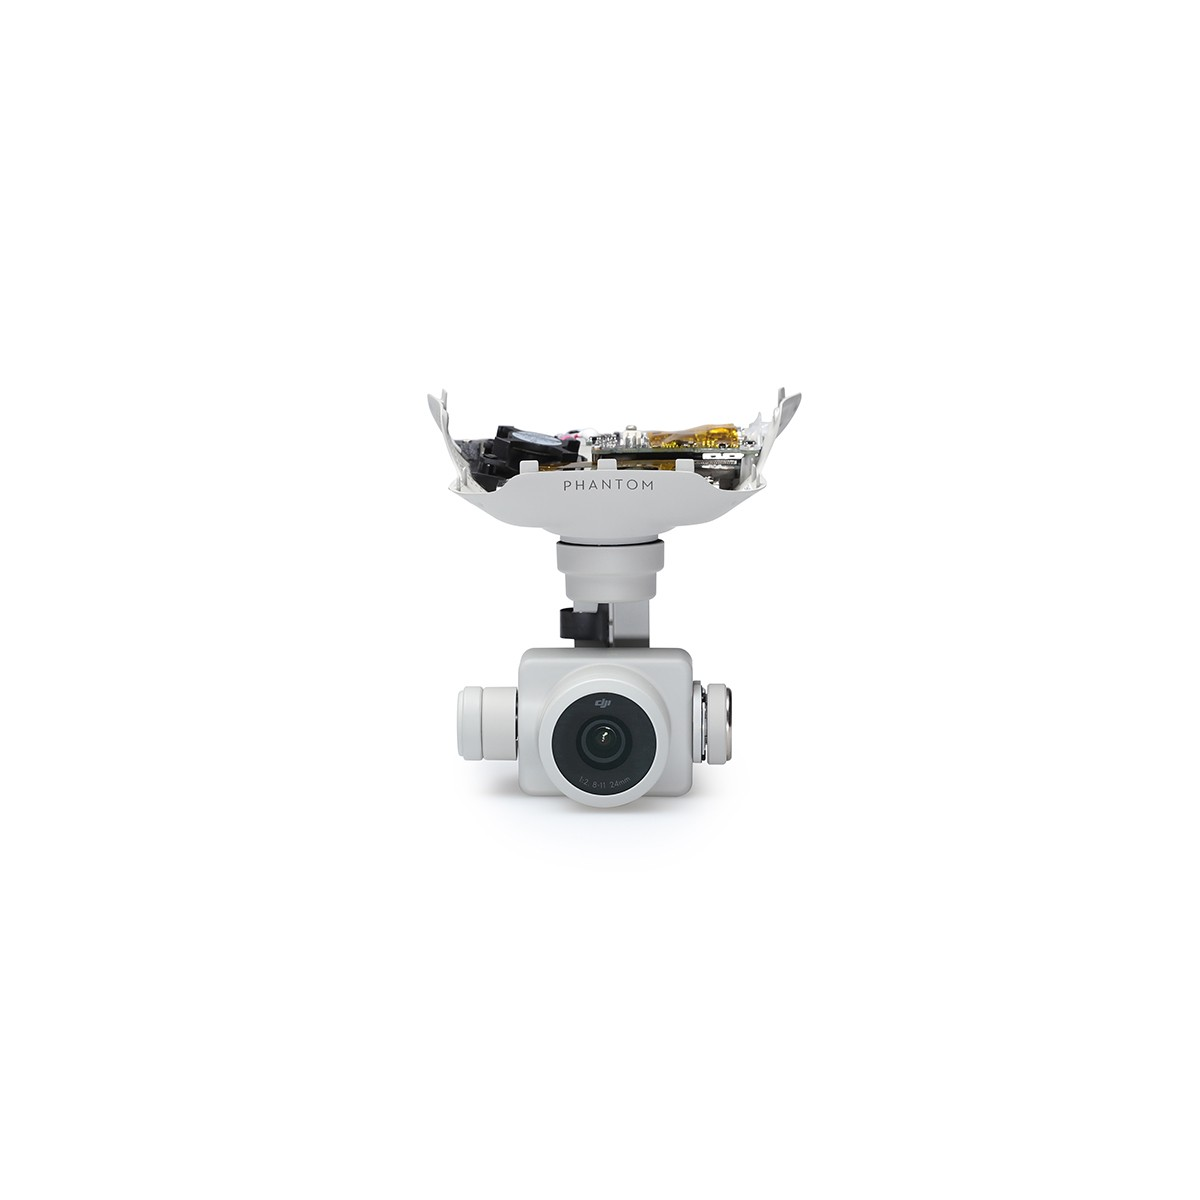 Replacement Camera Gimbal Lock Bracket Plate For DJI Phanton 4 UK OEM